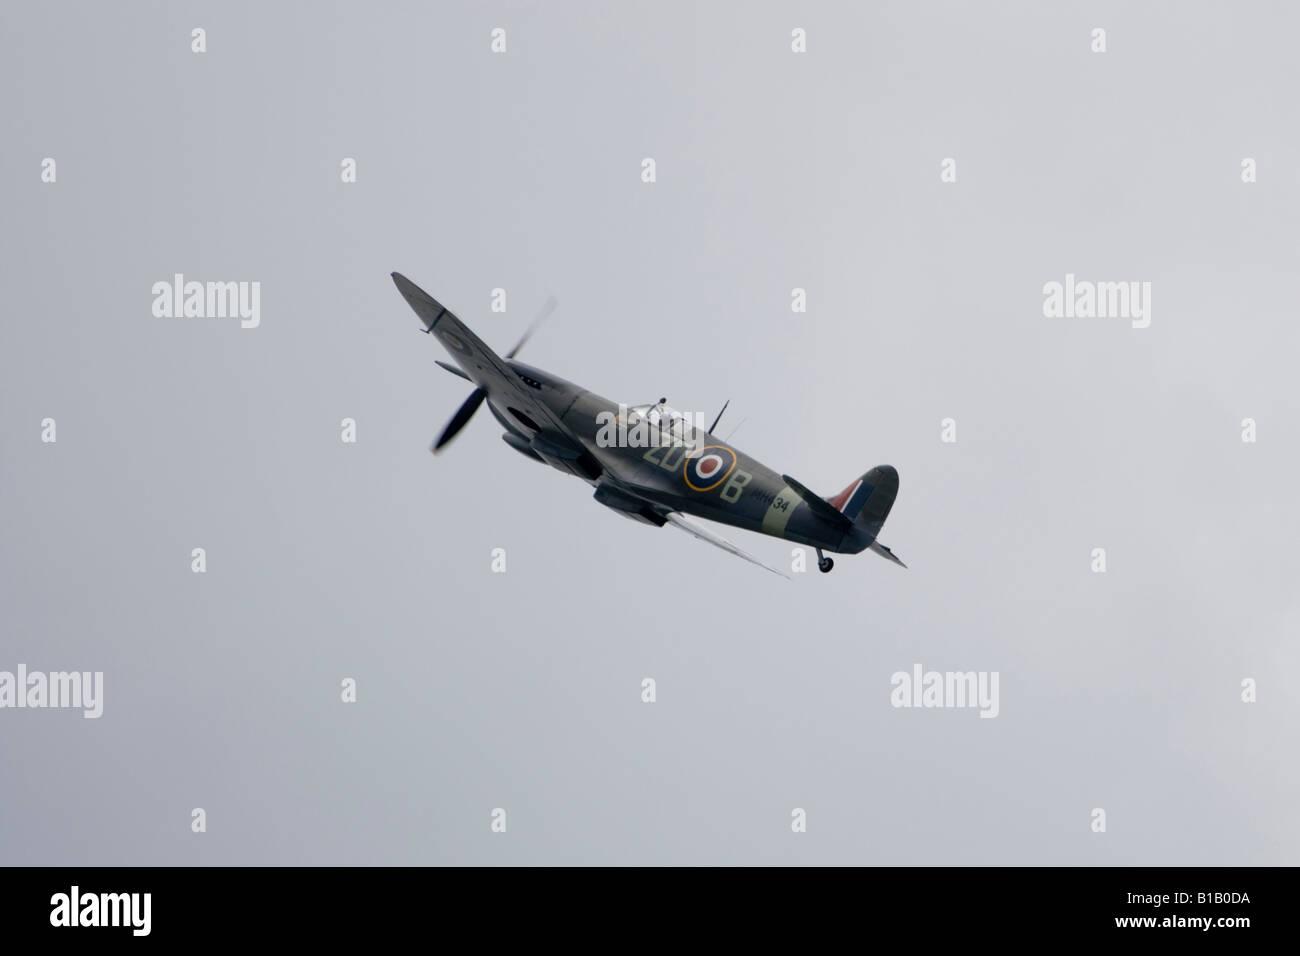 Spitfire Mk IX MH434 performs at the Biggin Hill Air Fair, Kent, England.  7th June 2008 - Stock Image